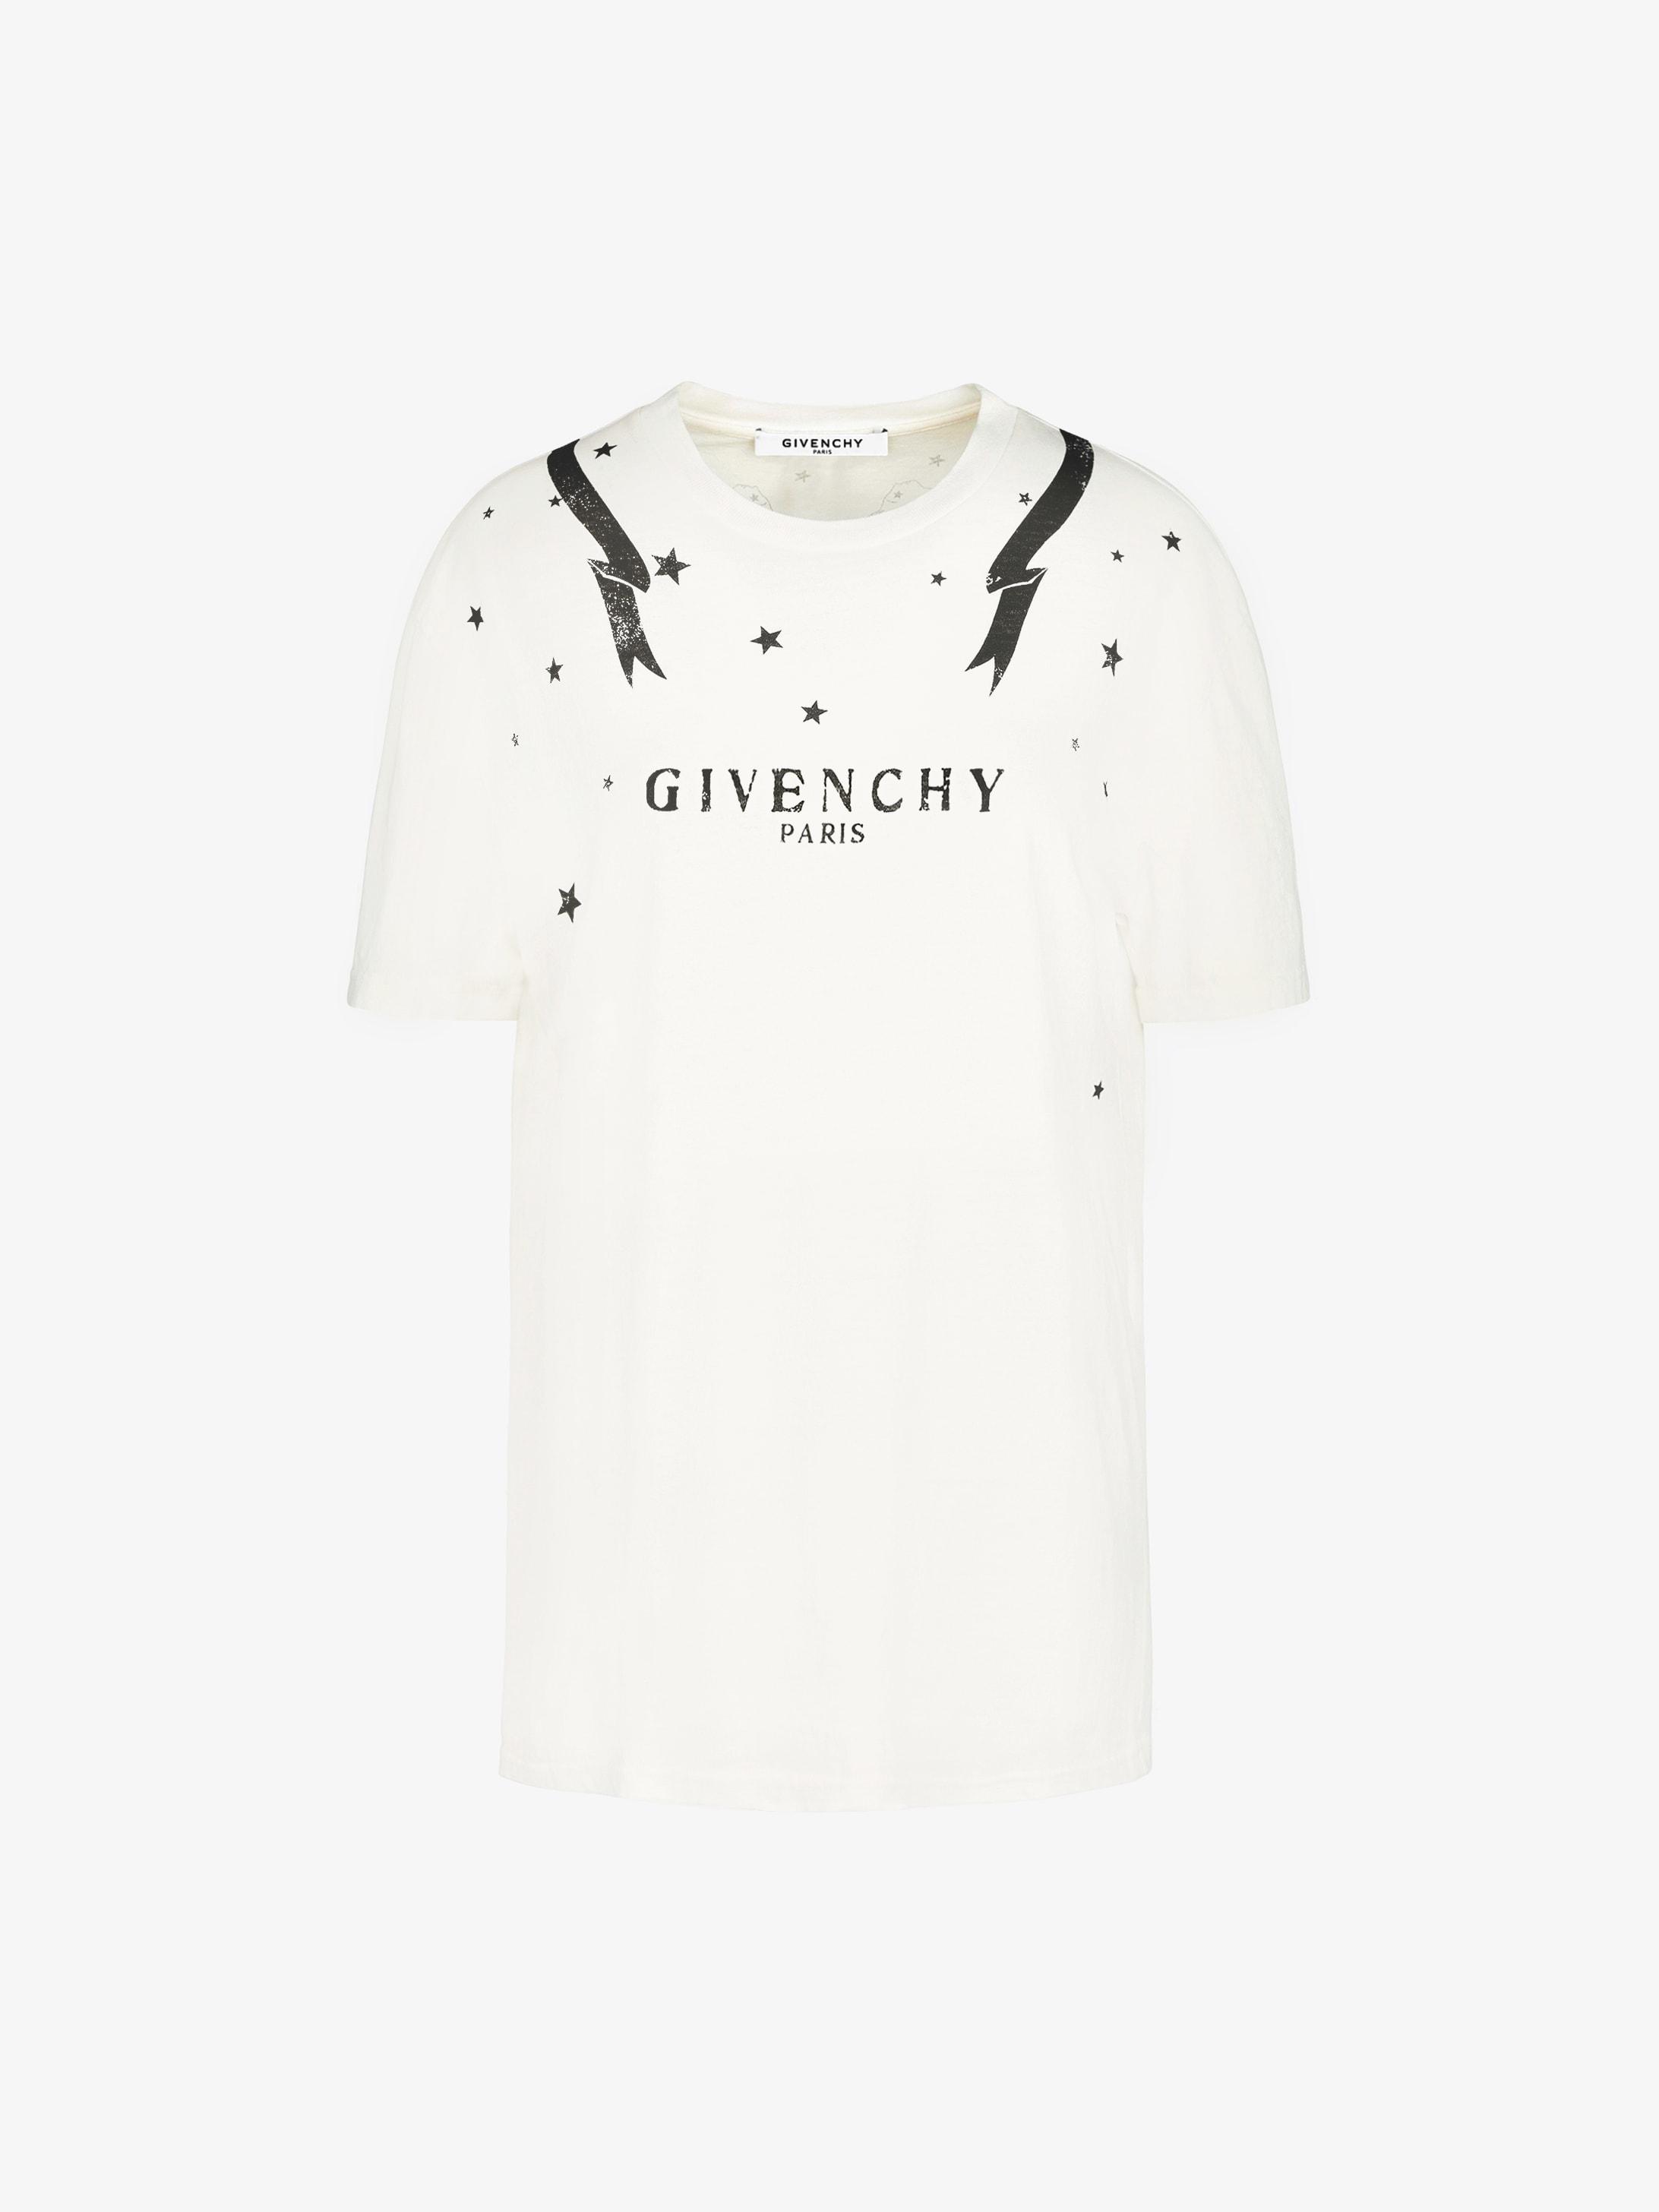 8ac4e71d8 Gemini printed oversized t-shirt | GIVENCHY Paris